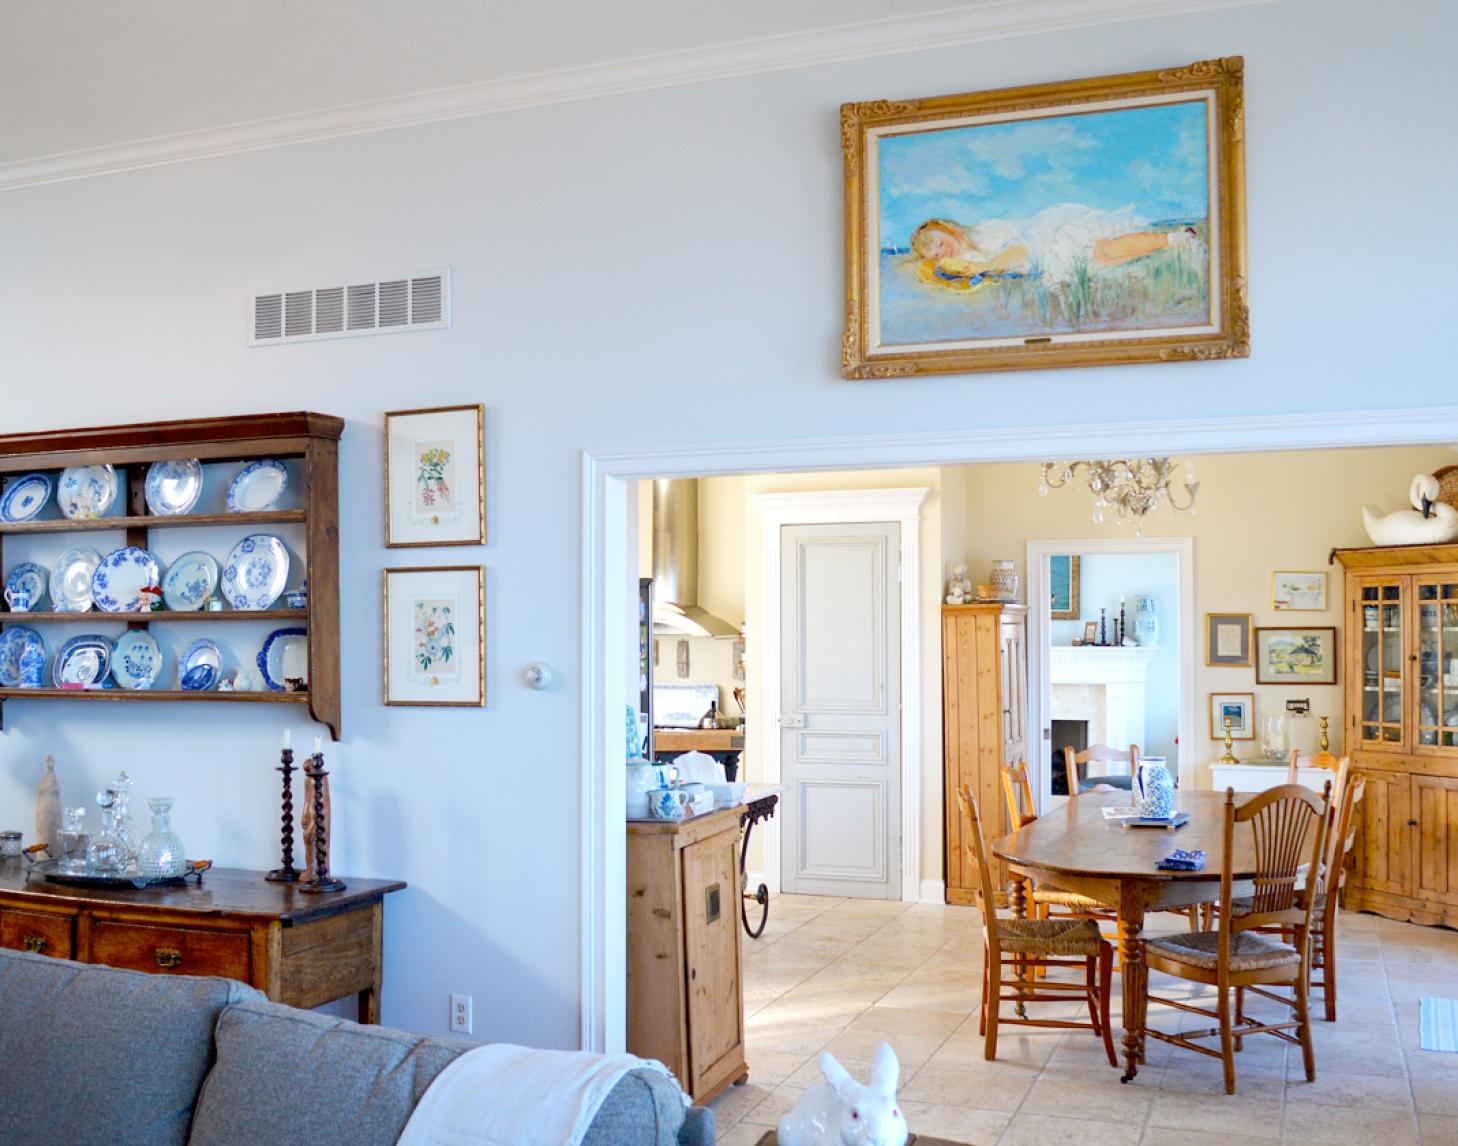 Paint Selection by Lake Interiors | © Lake Interiors Inc.